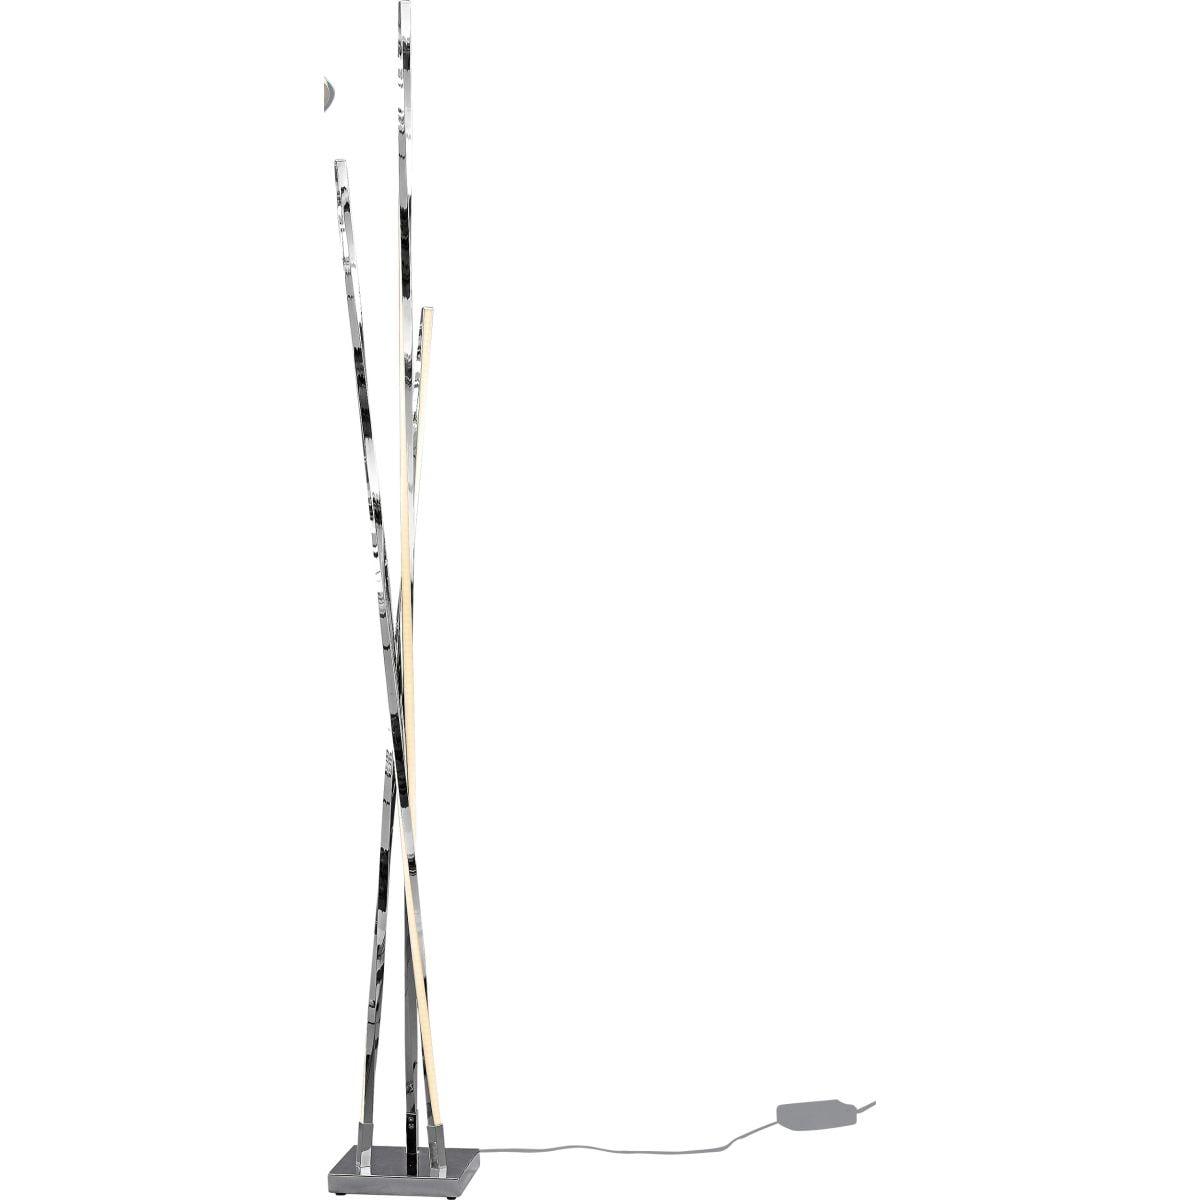 casanova led stehlampe twist porta porta m bel. Black Bedroom Furniture Sets. Home Design Ideas